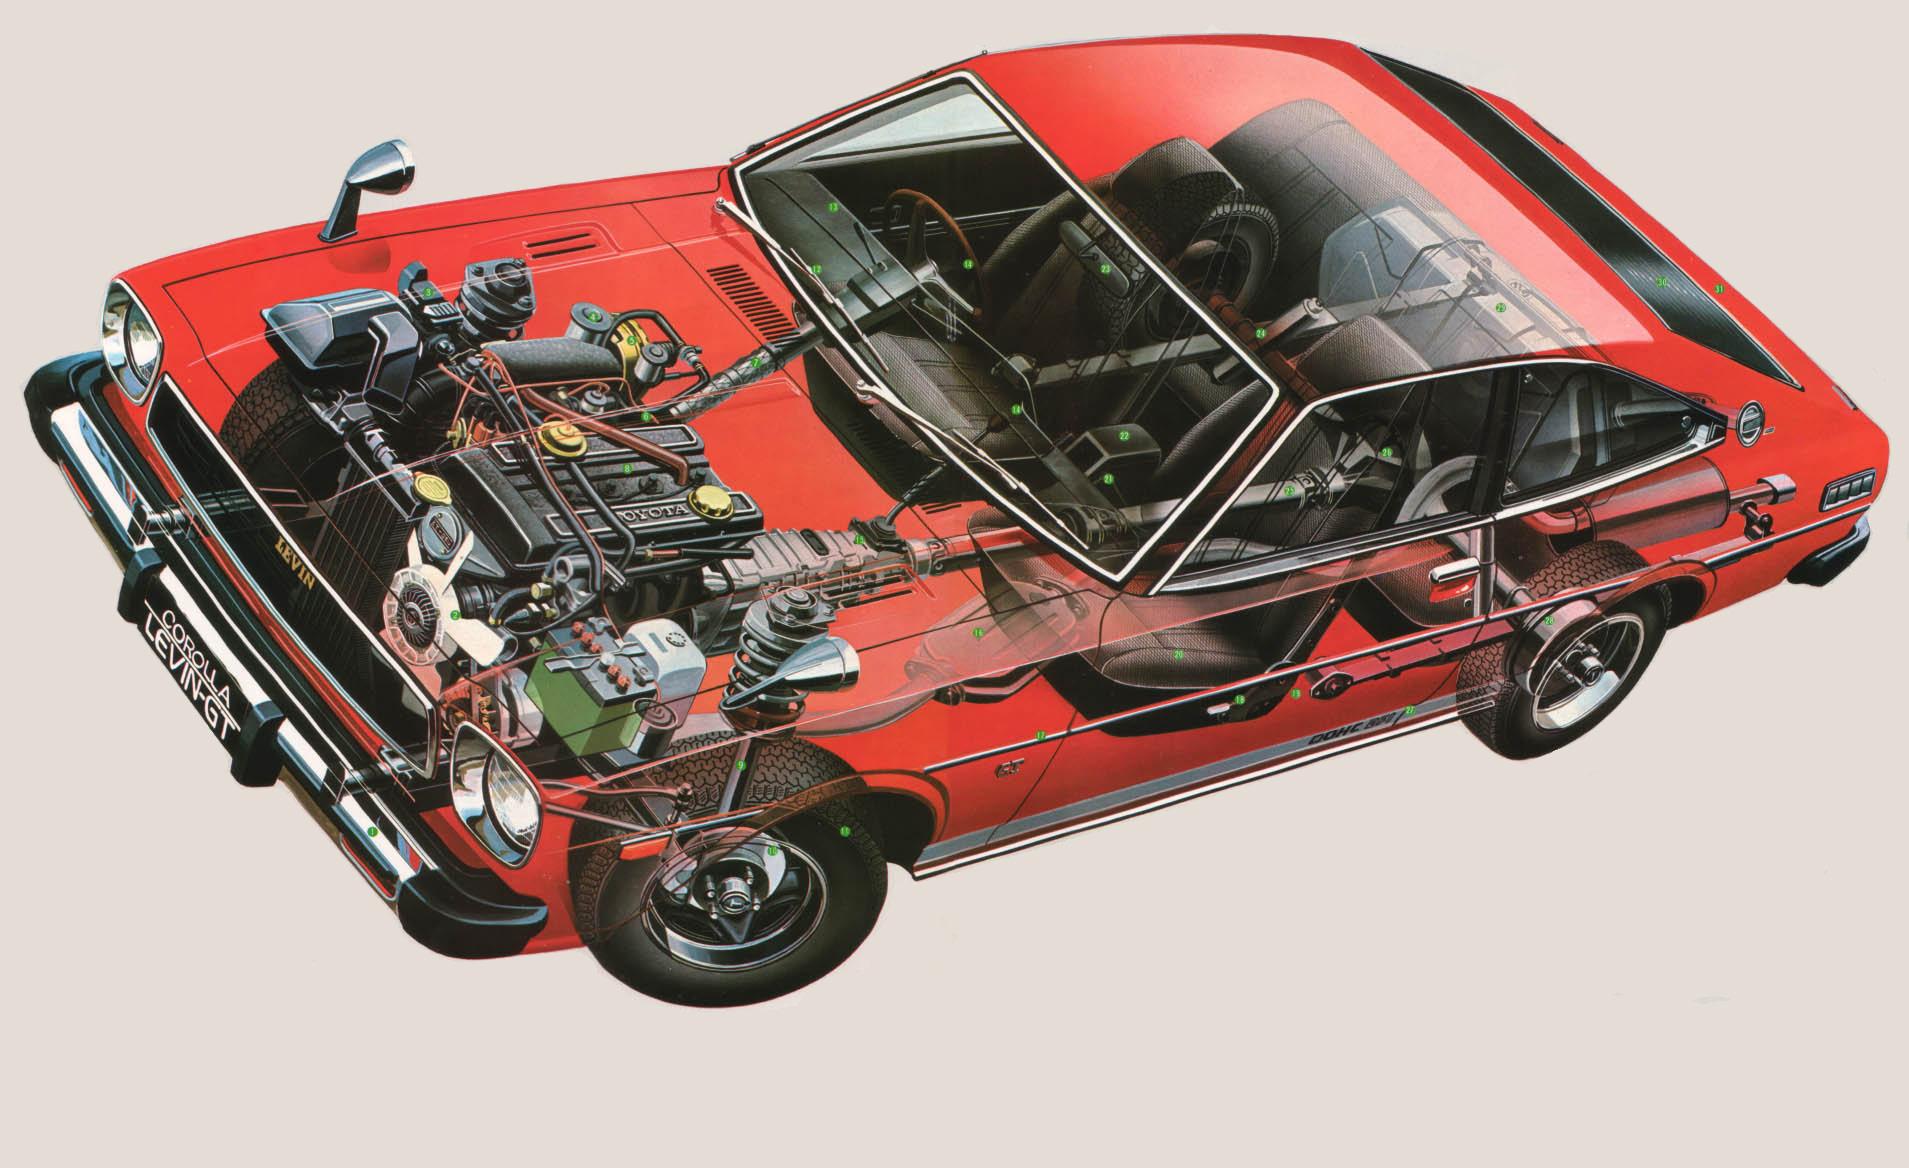 Toyota Corolla cutaway